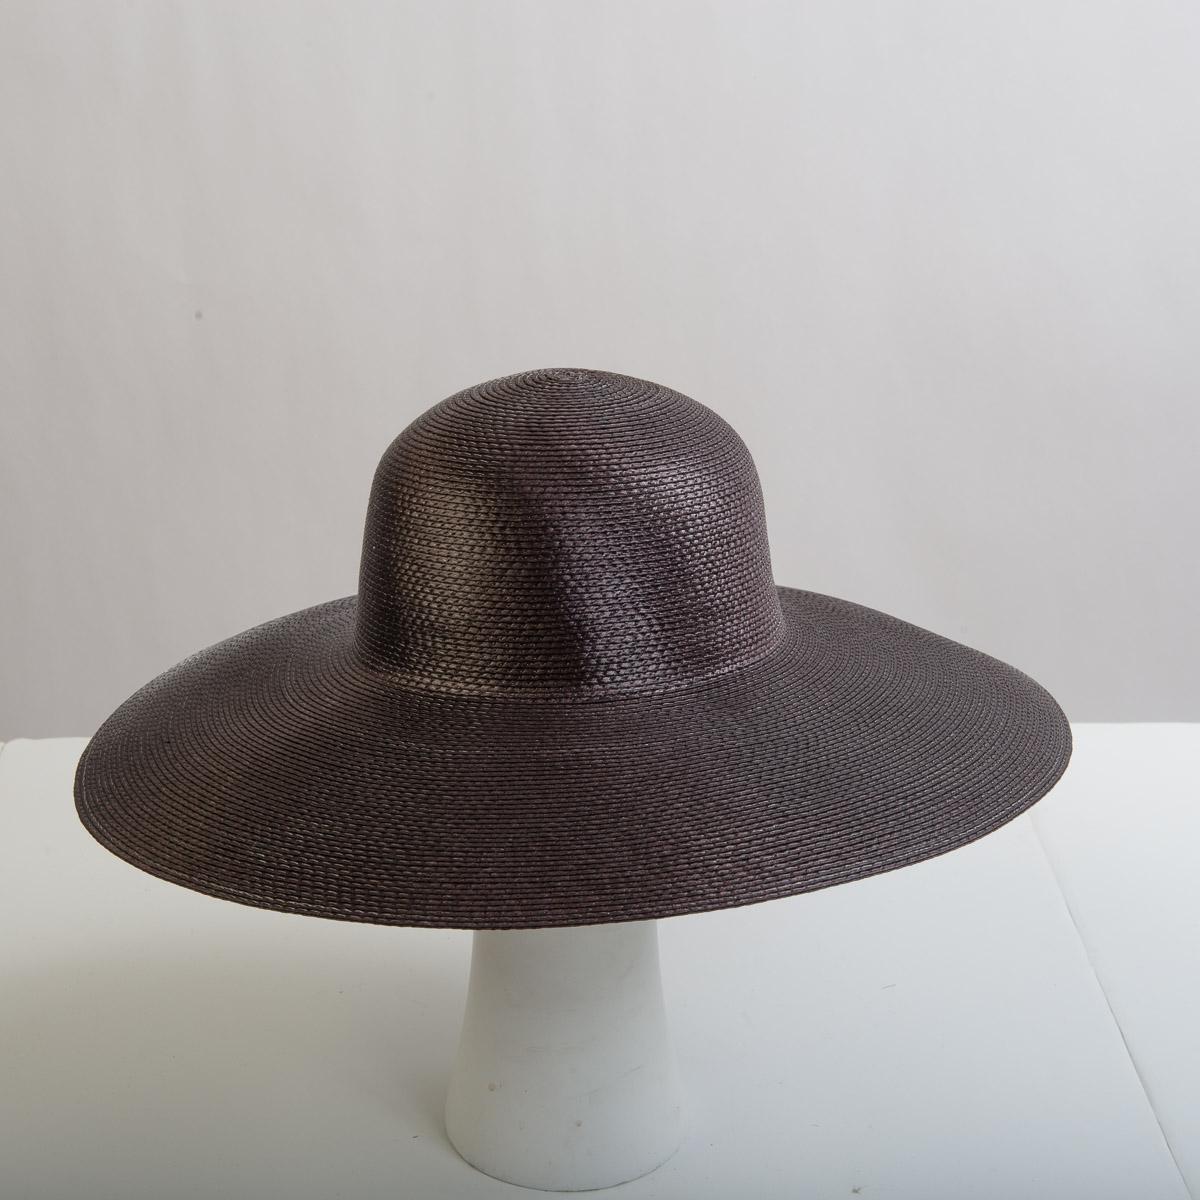 9deca9c2 Polypropylene Straw Wide Brim Plain Hats-HR01-5-Sun Yorkos   Zoria